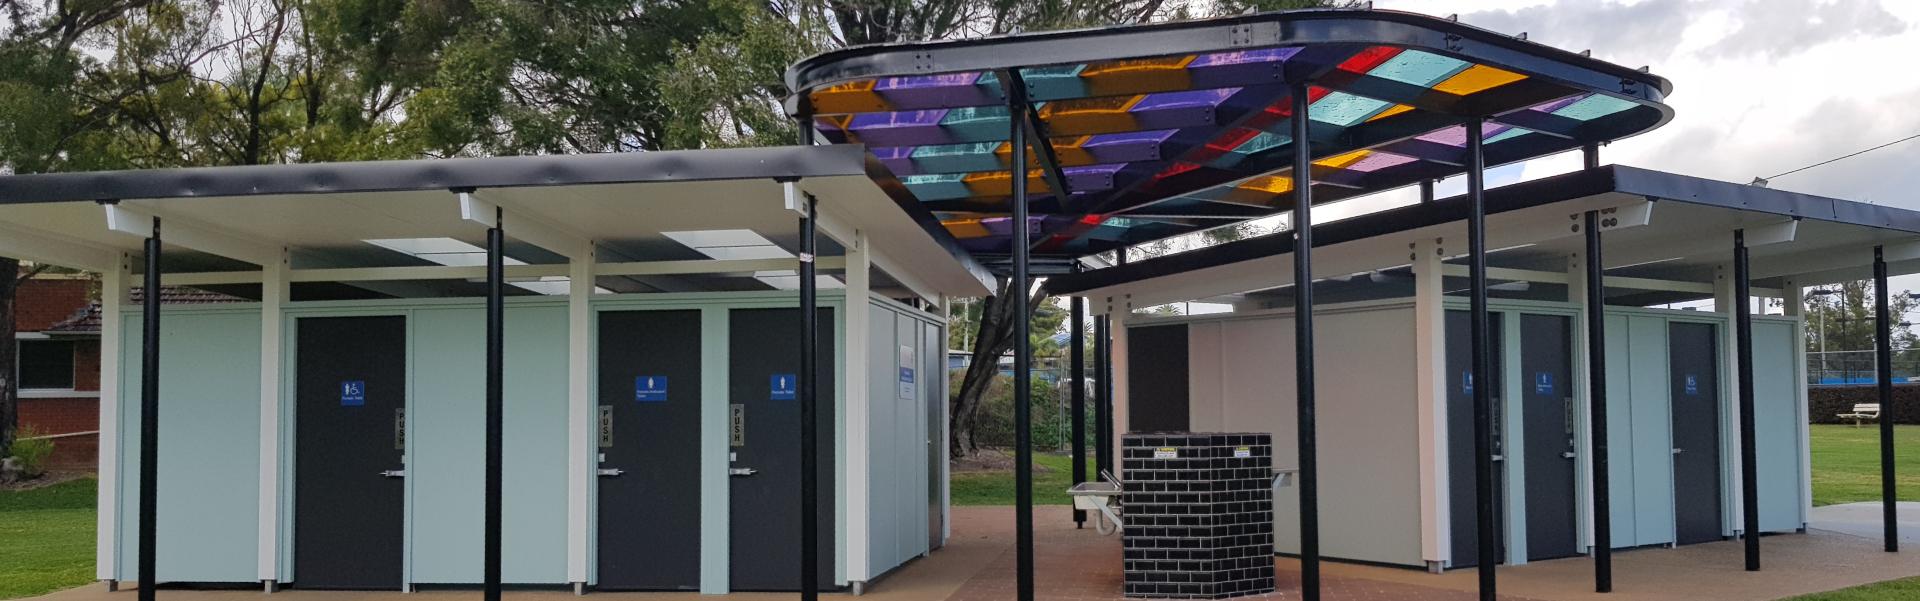 Photo of public toilets at Knox Park, Murwillumbah.